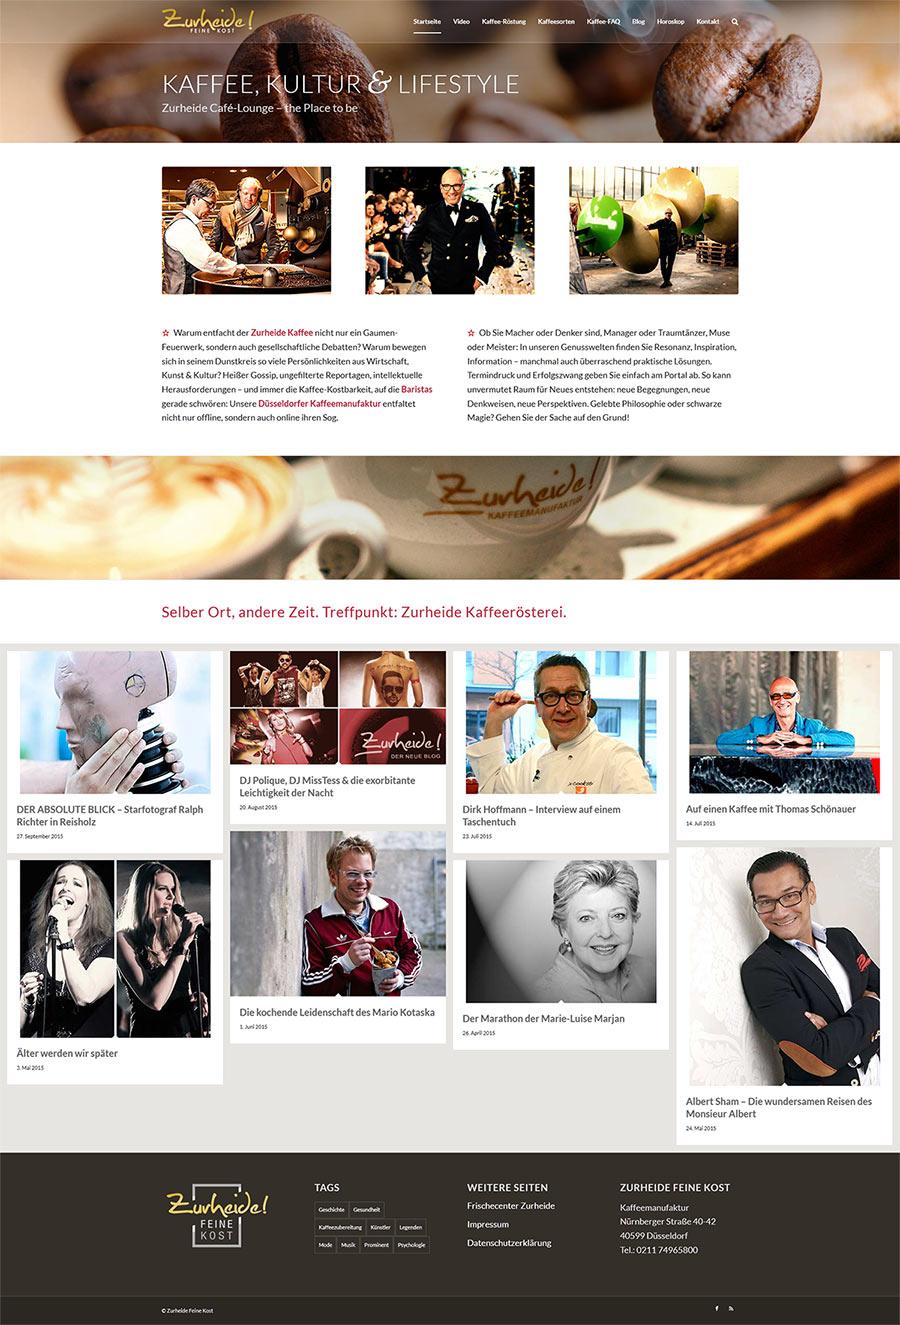 Screenshot: Website Zurheide Kaffee-Manufaktur Düsseldorf